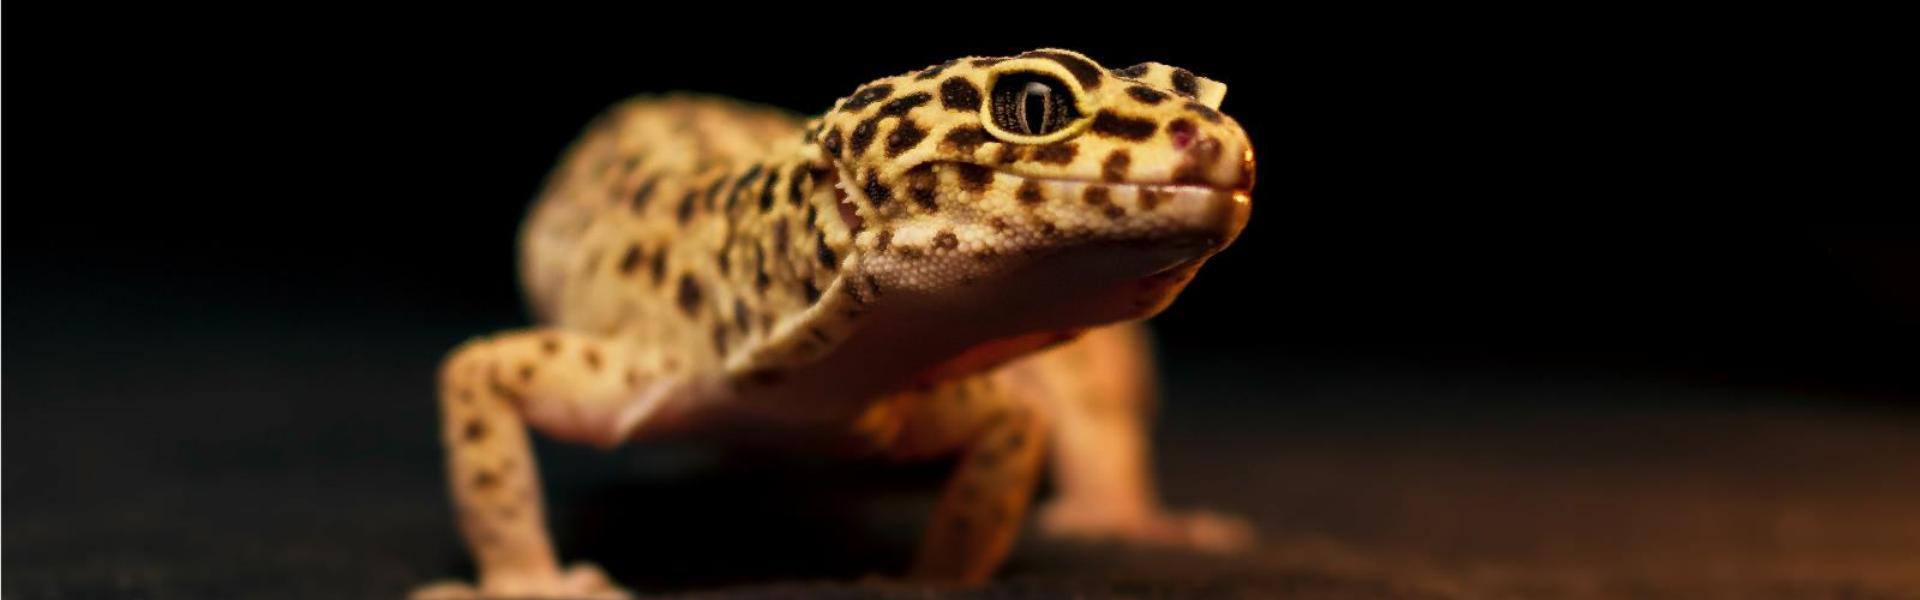 5 specii de reptile potrivite ca animale de companie